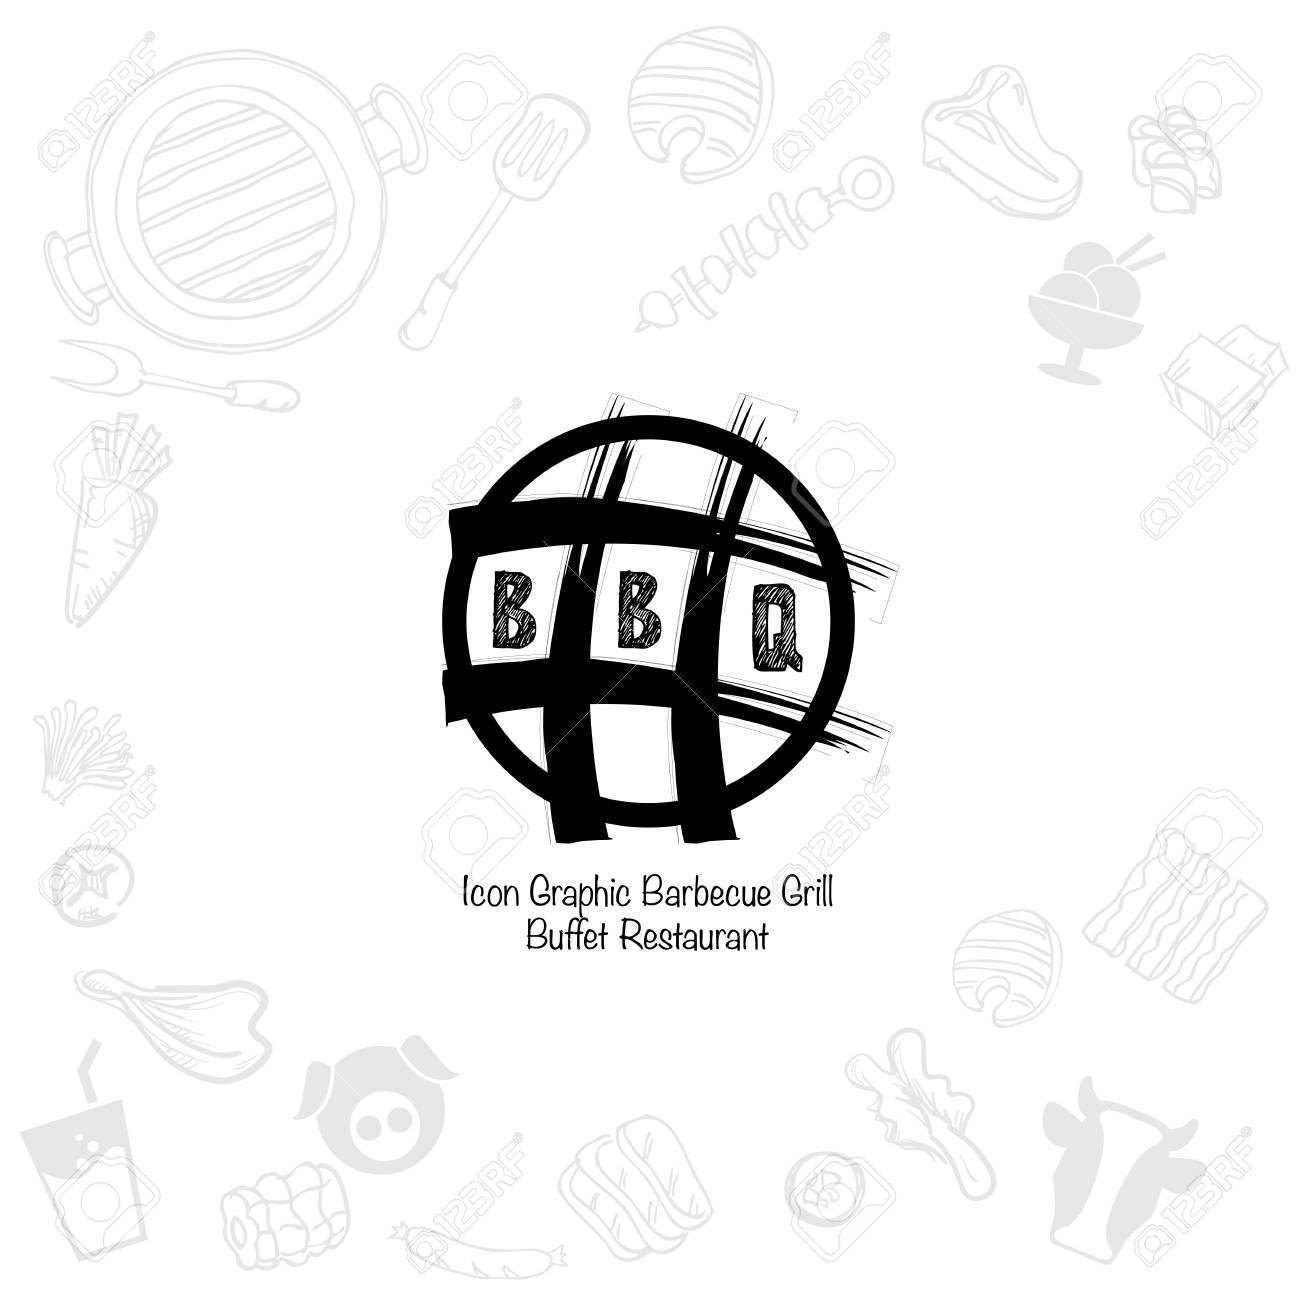 Barbecue Grill Logo Icon Graphic Buffet Restaurant